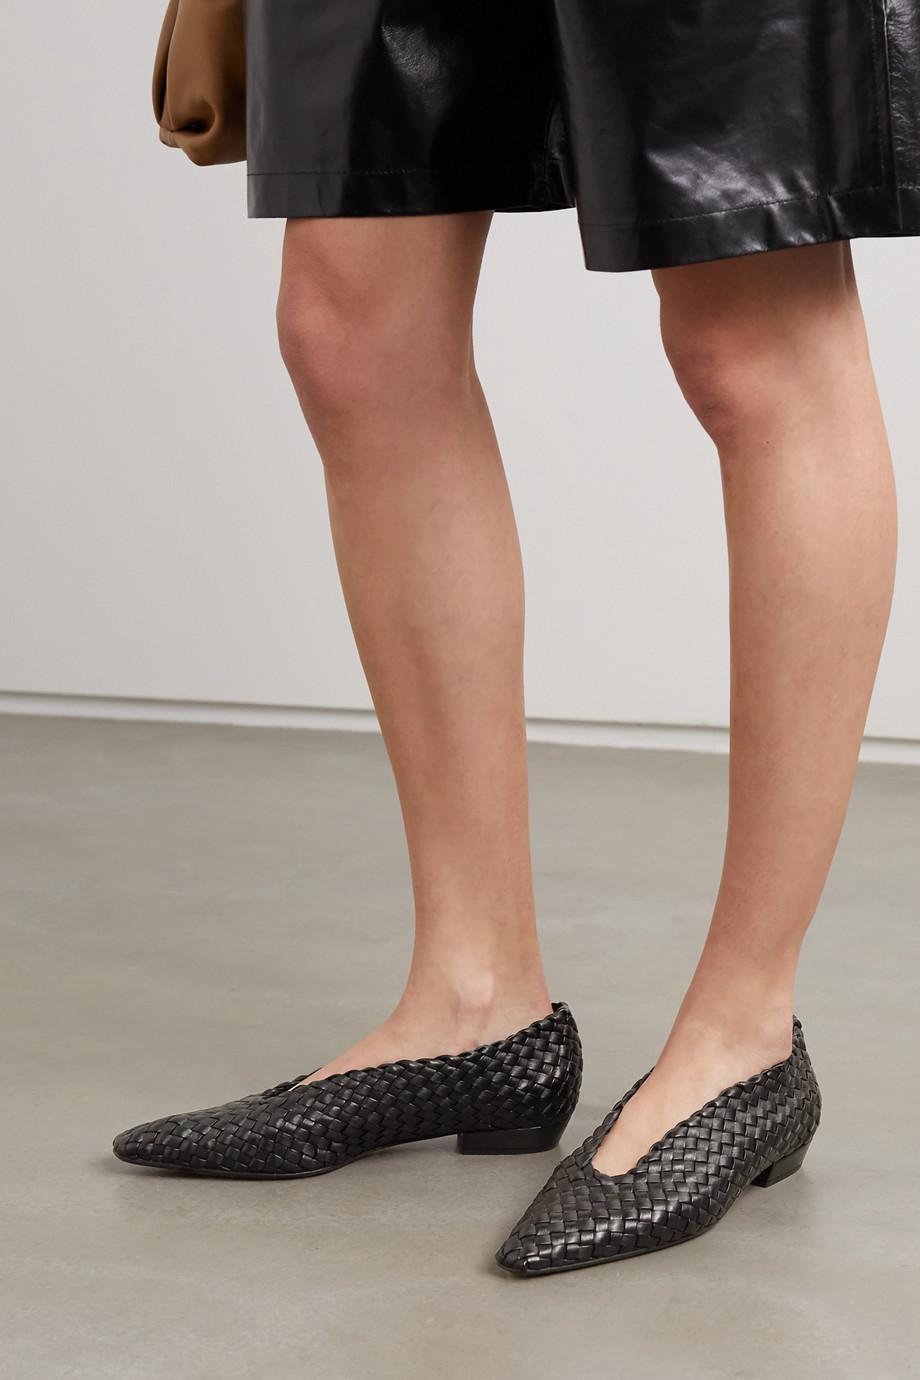 Bottega Veneta Intrecciato leather point-toe flats